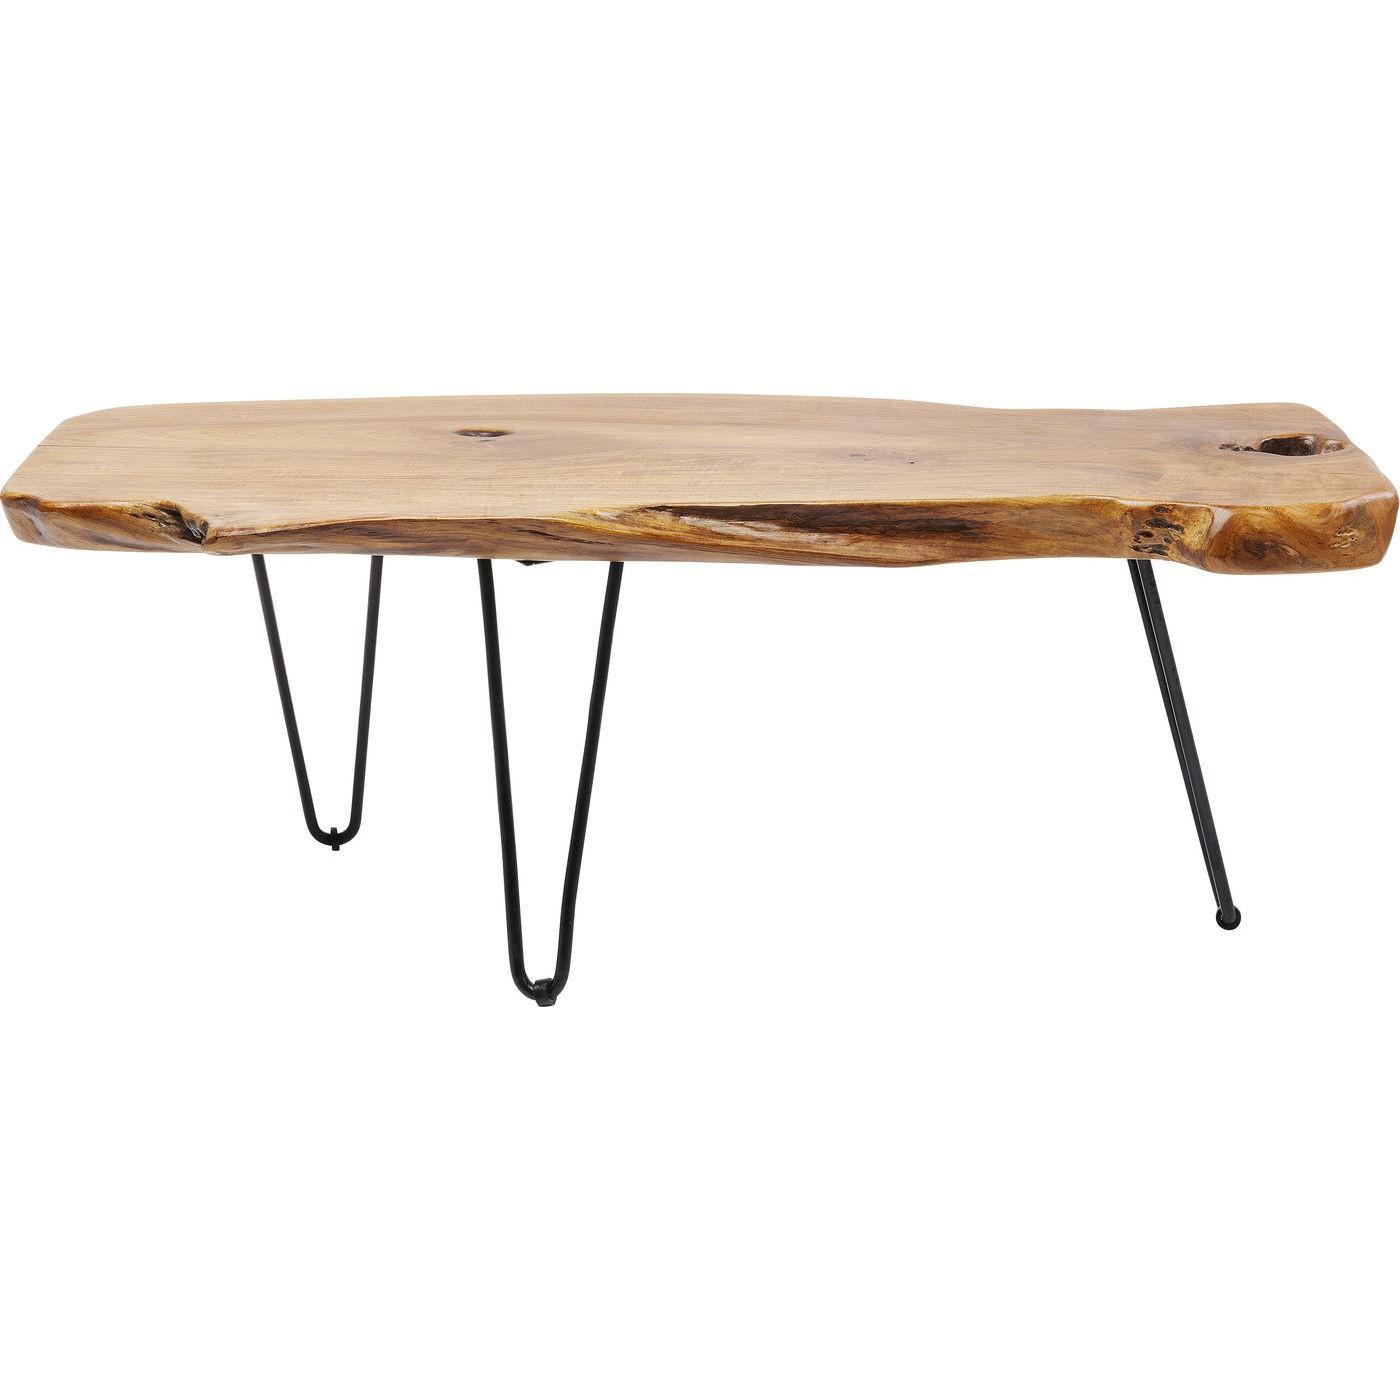 Table basse en teck massif et acier